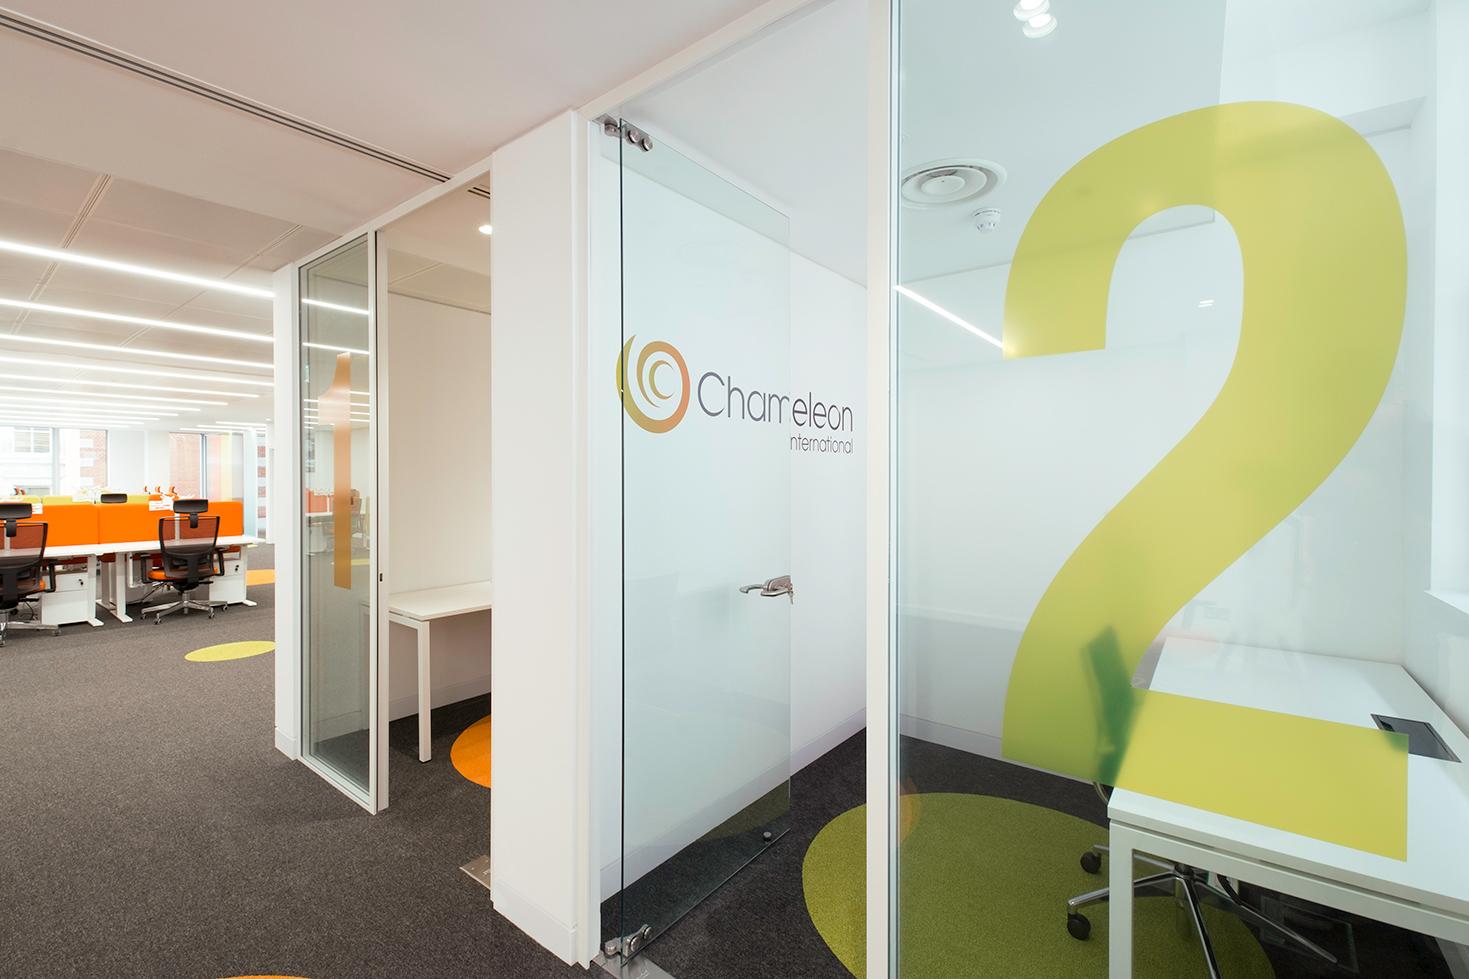 office using flooring to match brand identity